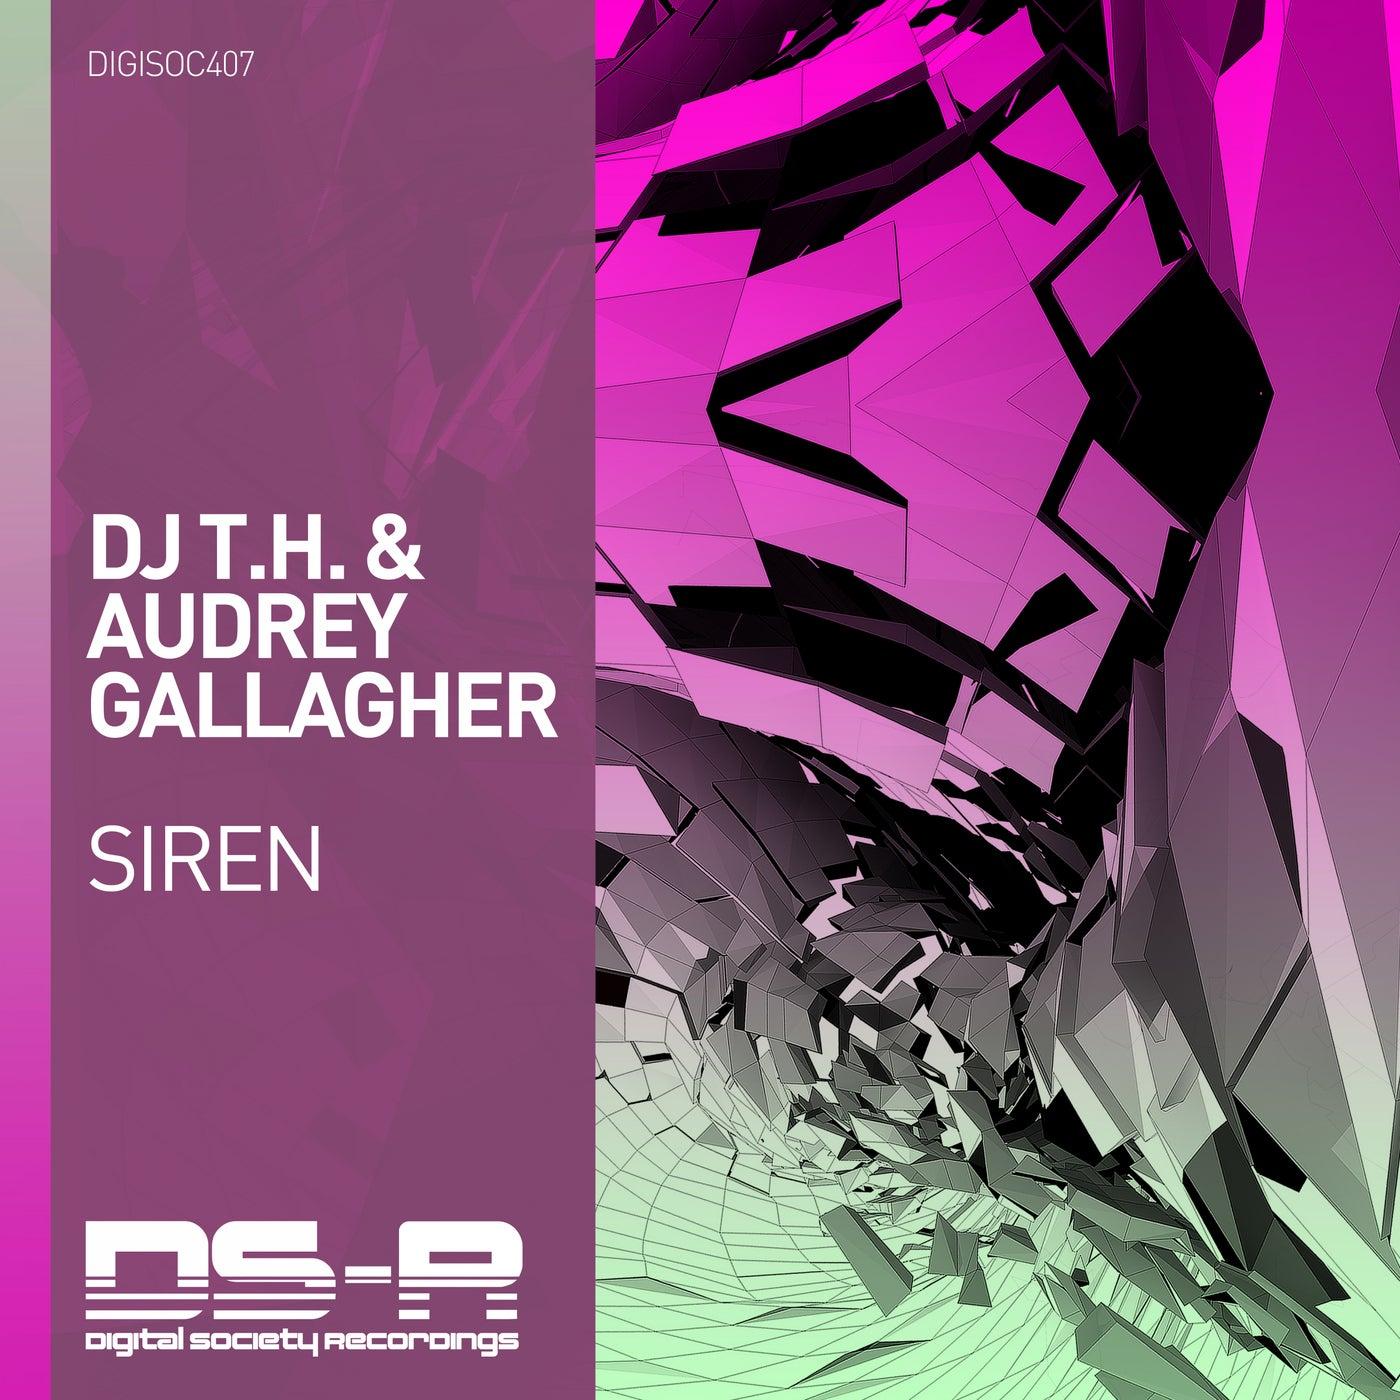 Siren (Extended Mix)